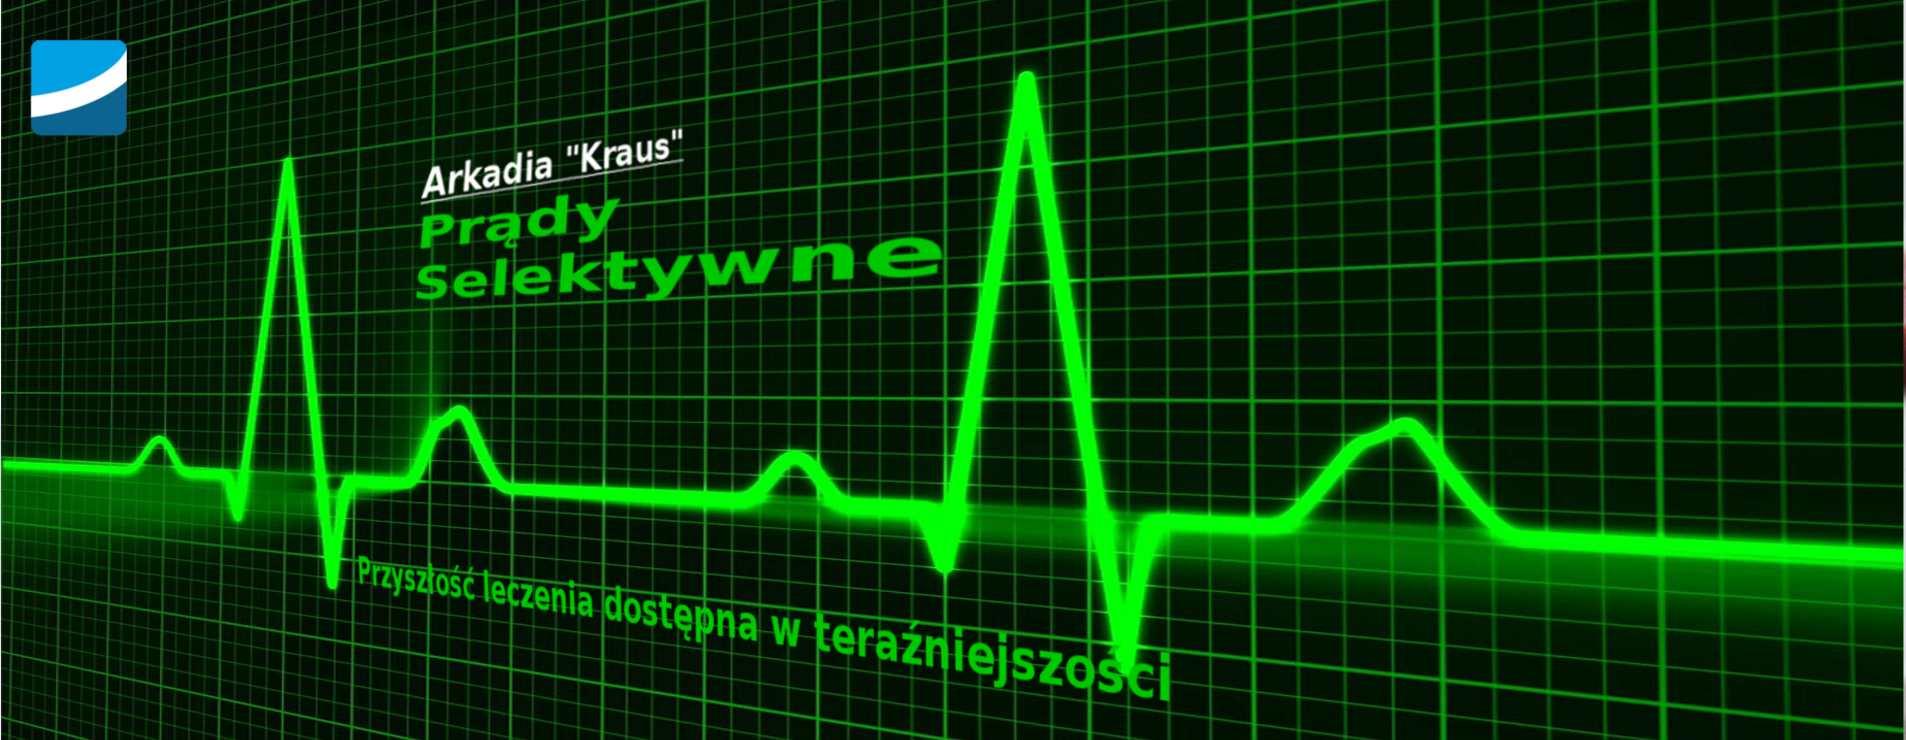 https://kraus-system.pl/wp-content/uploads/2019/01/ps_arkadiakraus_banerwww.jpg